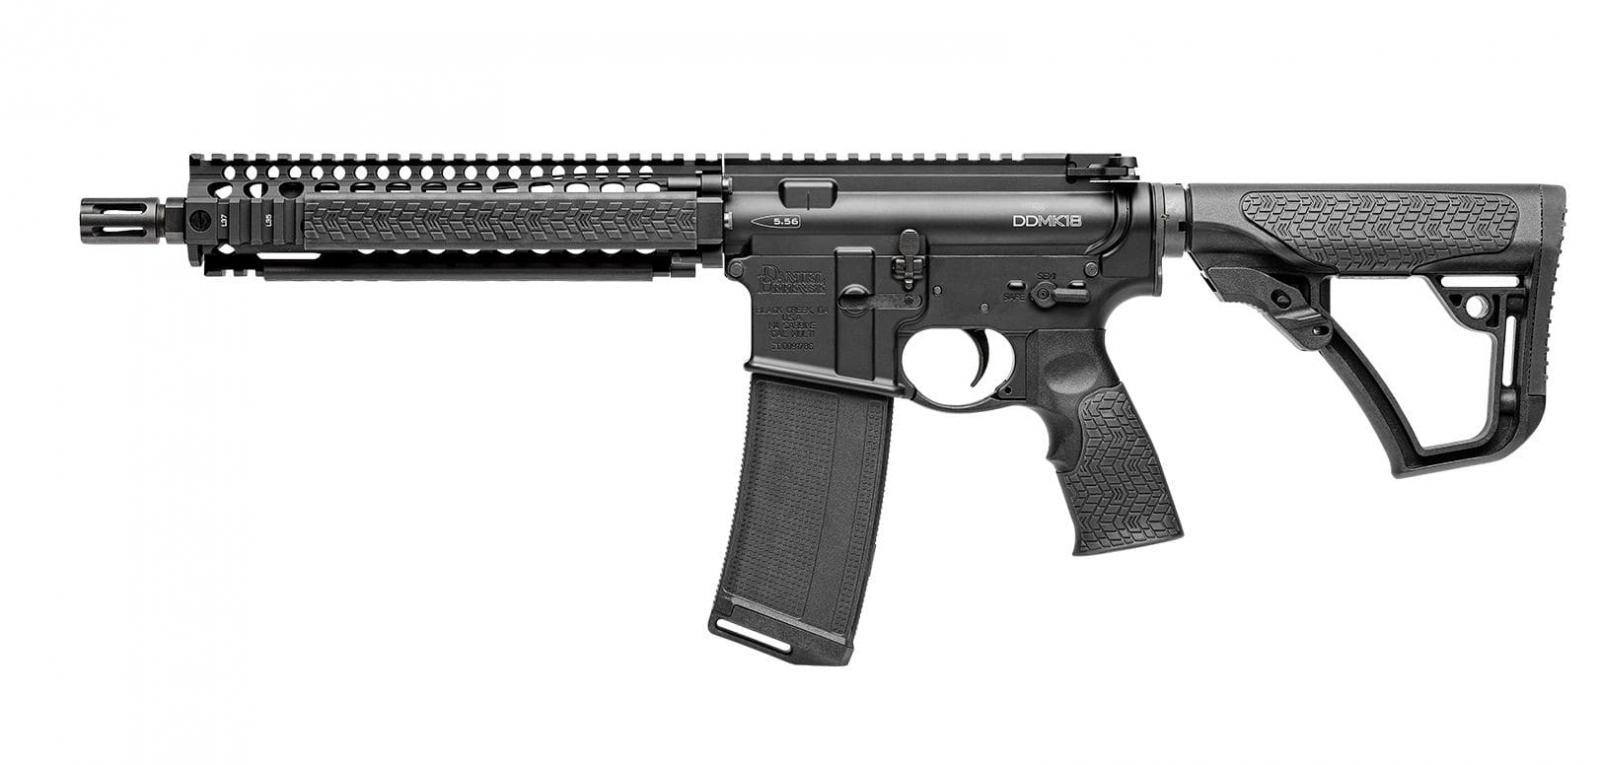 Carabine type AR15 DANIEL DEFENSE MK 18 canon court 10,3'' 5,56 mm (223 Rem)